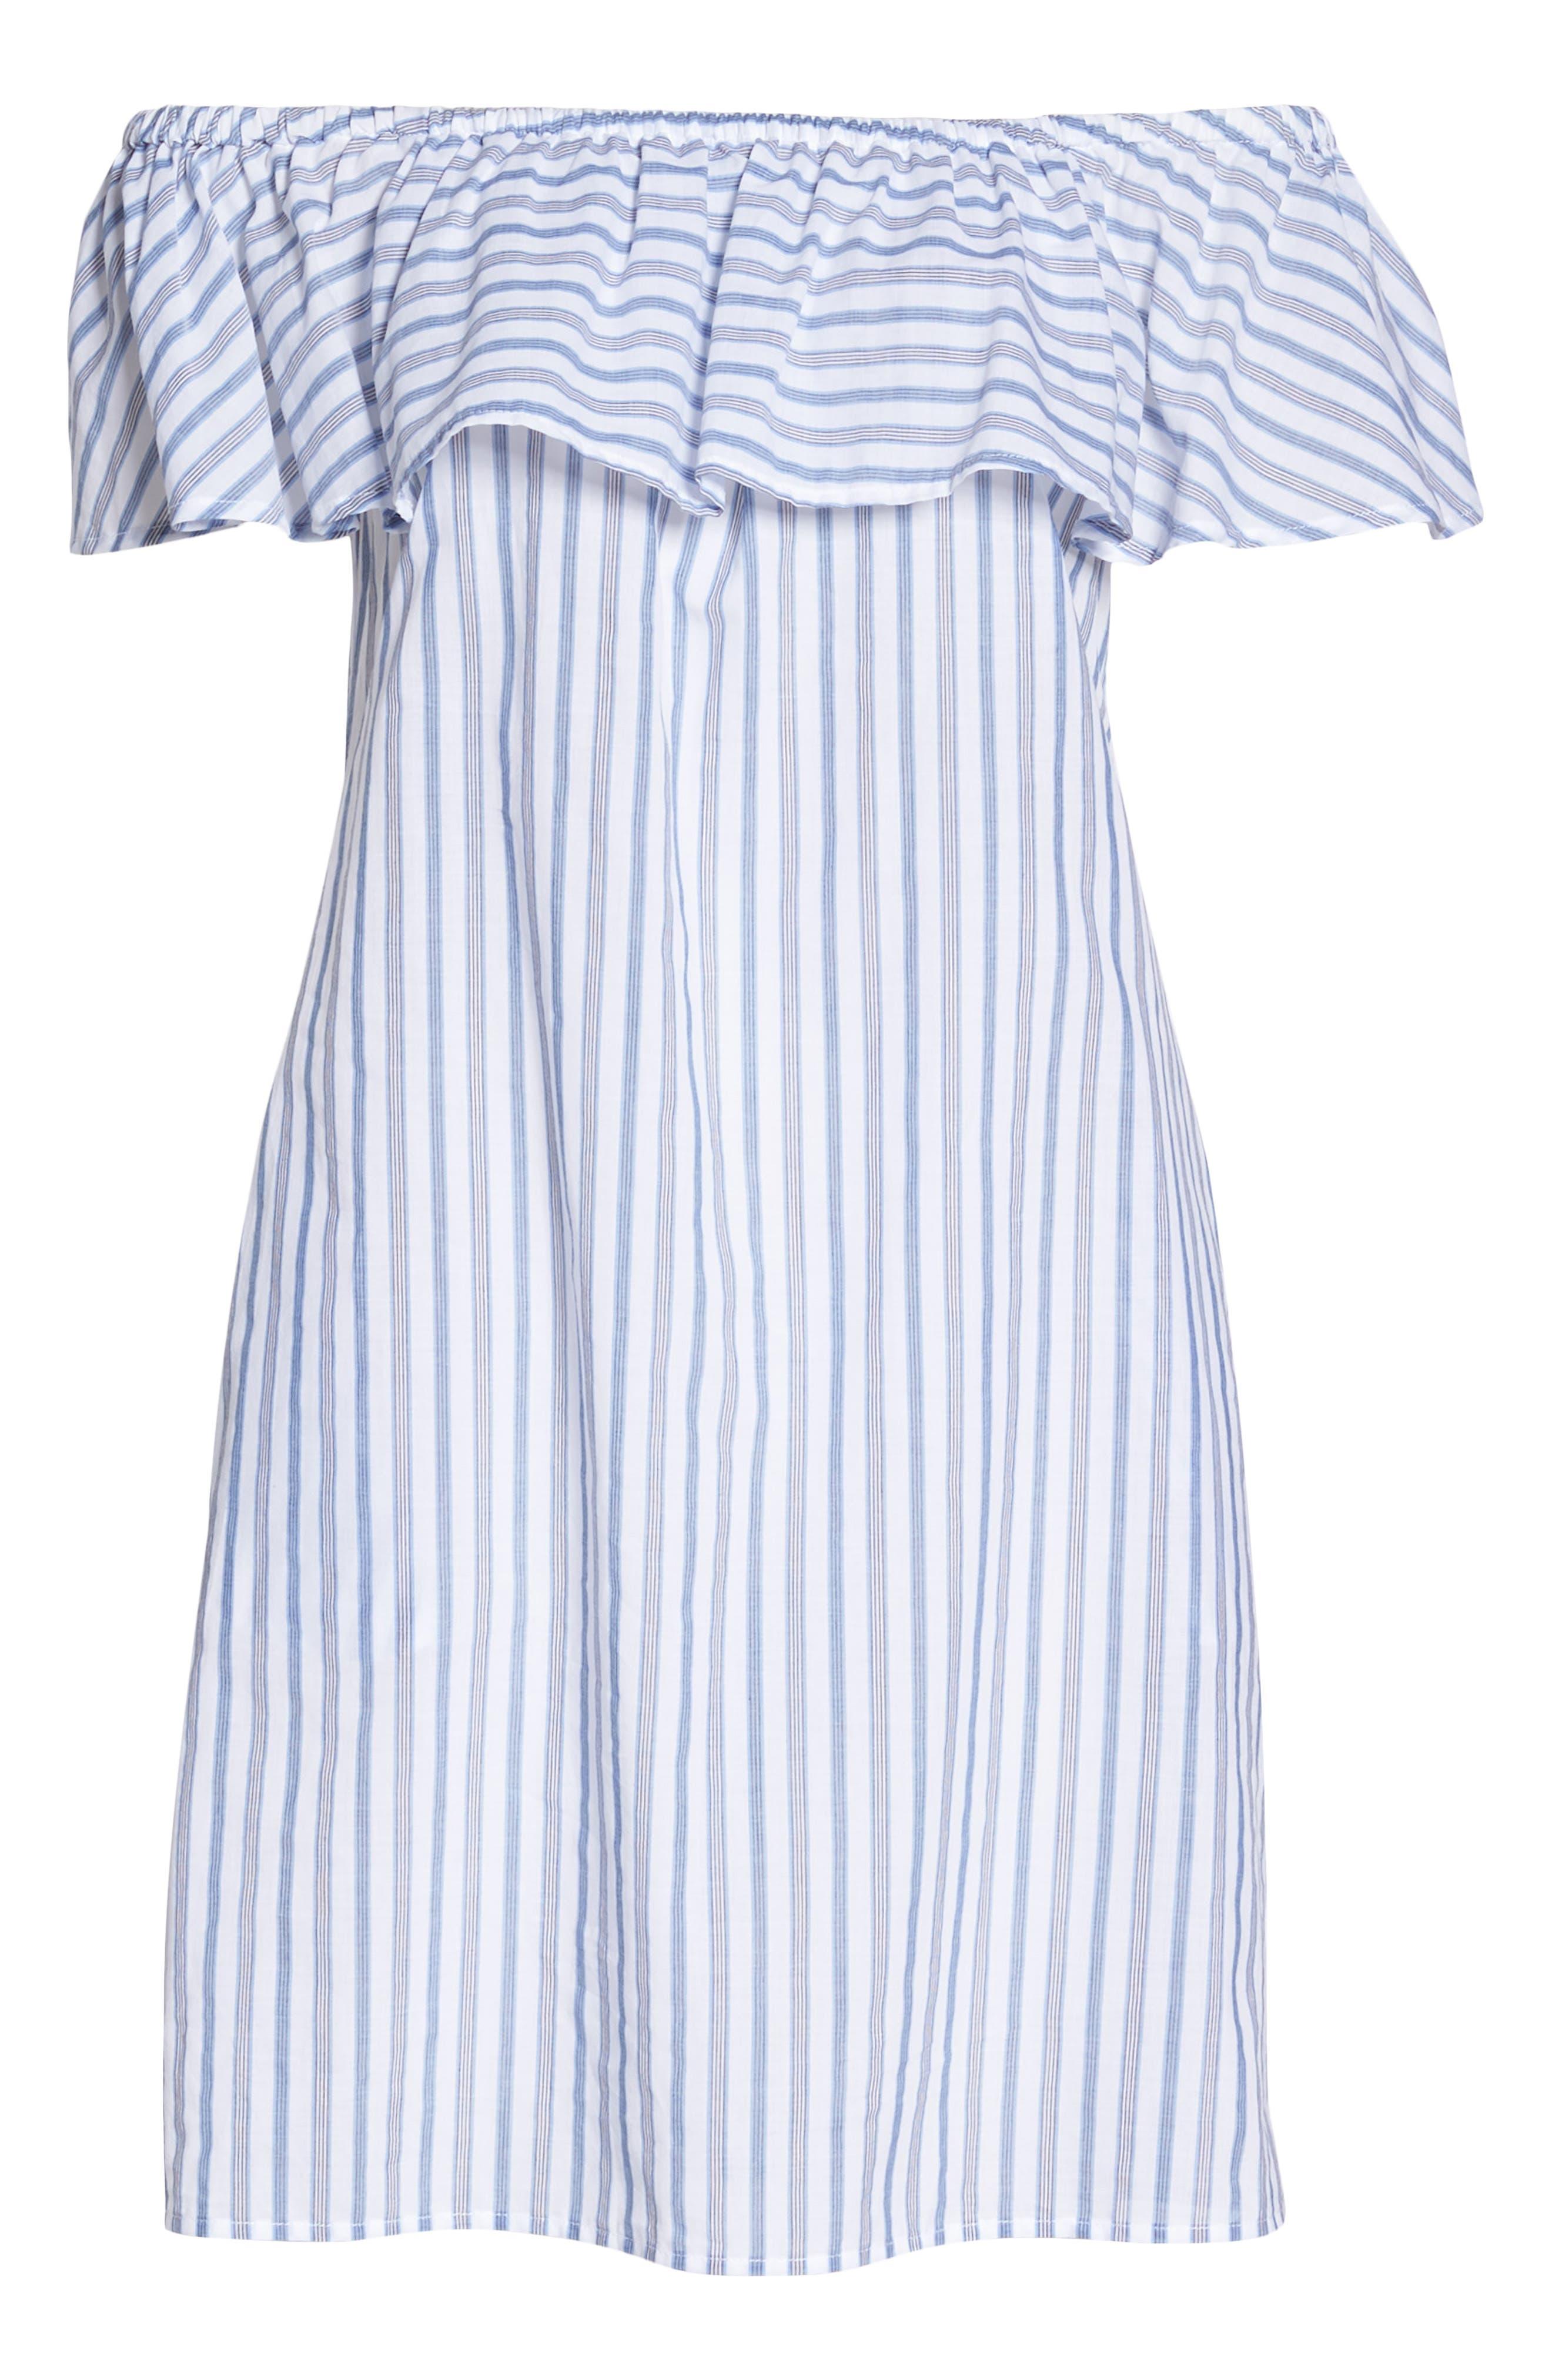 Ticking Stripe Off the Shoulder Cover-Up Dress,                             Alternate thumbnail 6, color,                             100